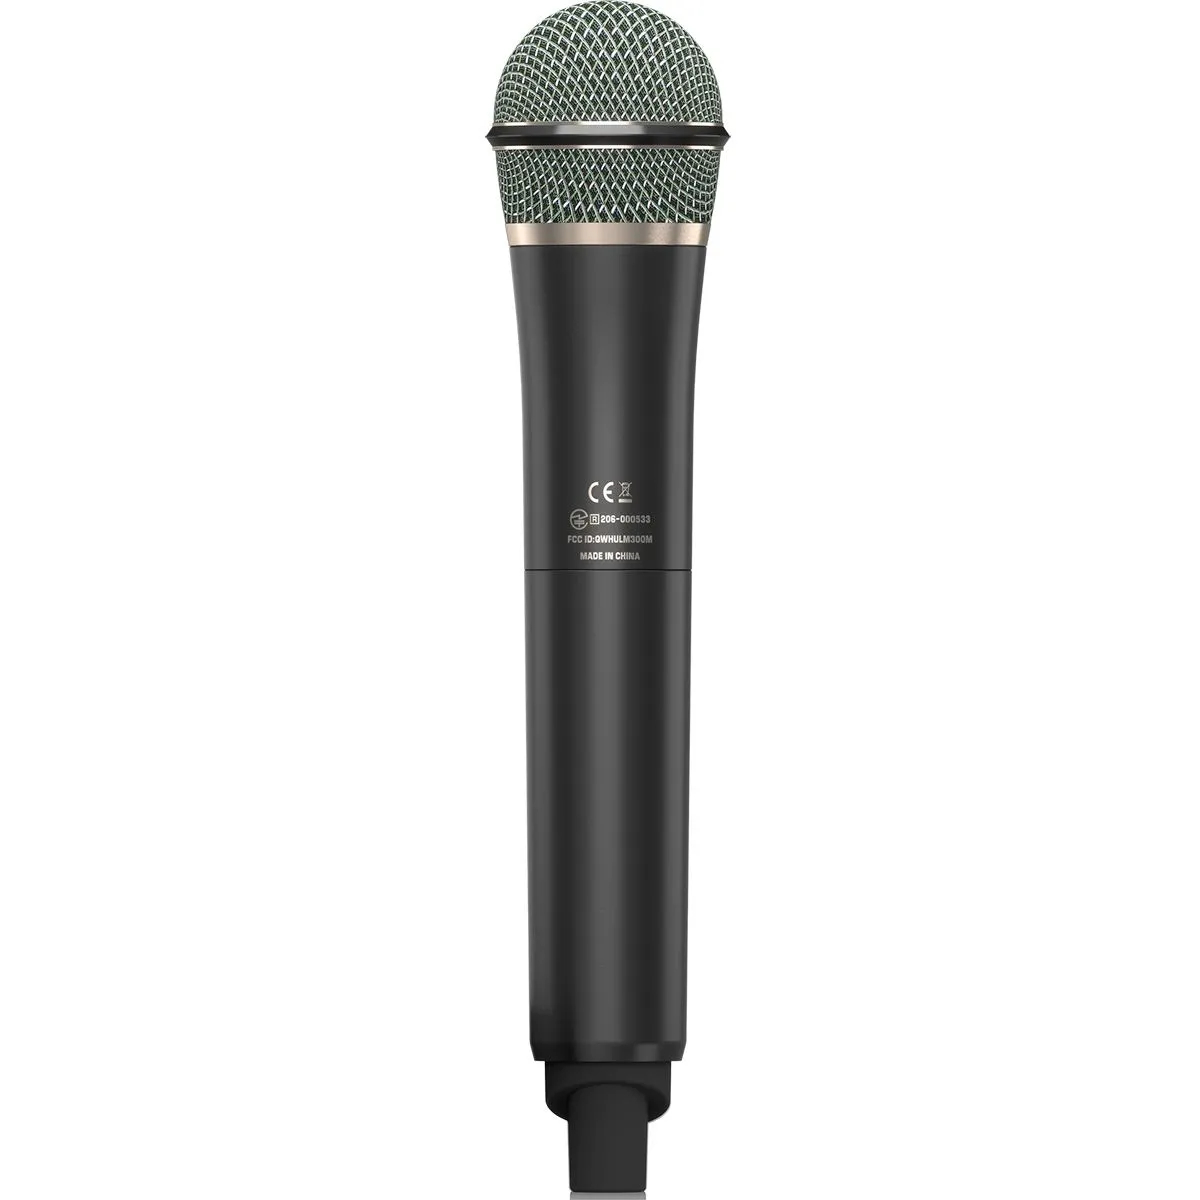 Microfone Sem Fio Behringer 2.4Ghz ULM300MIC Digital